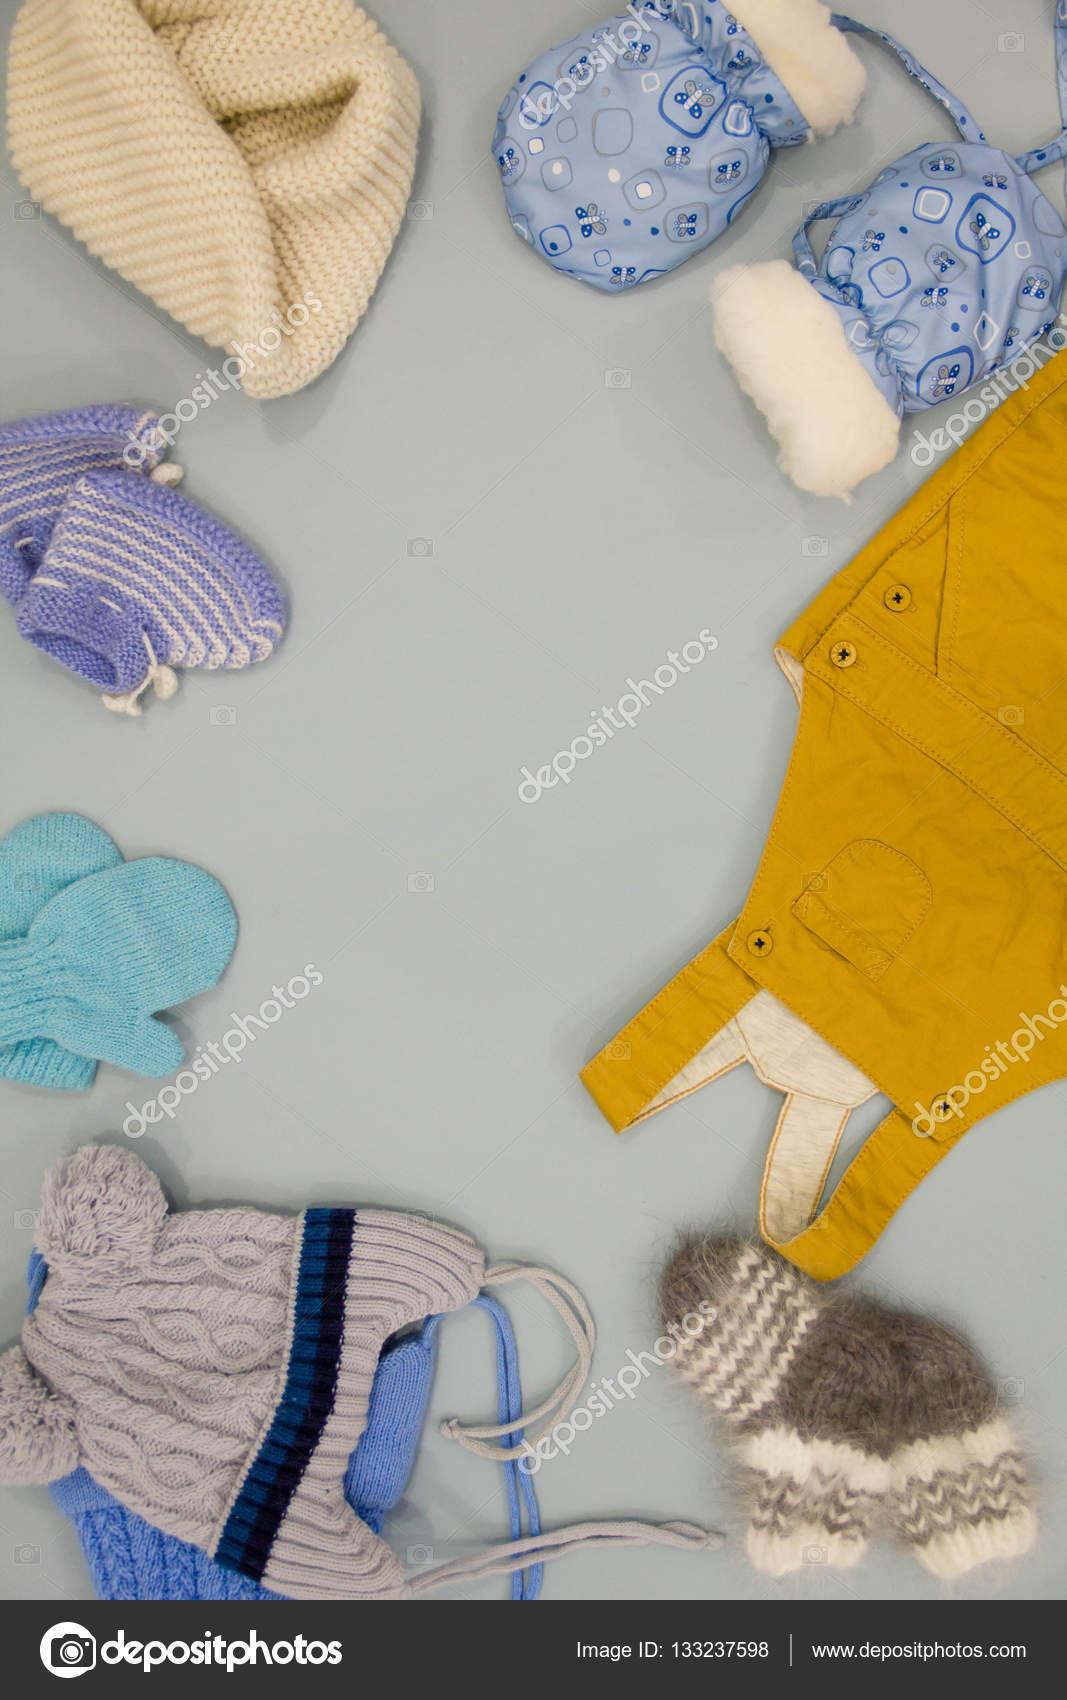 c0c156fe81a1 Σωρός από πλεκτό χειμωνιάτικα ρούχα σε φόντο ξύλινη καλυμμένη με  φθινοπωρινά φύλλα